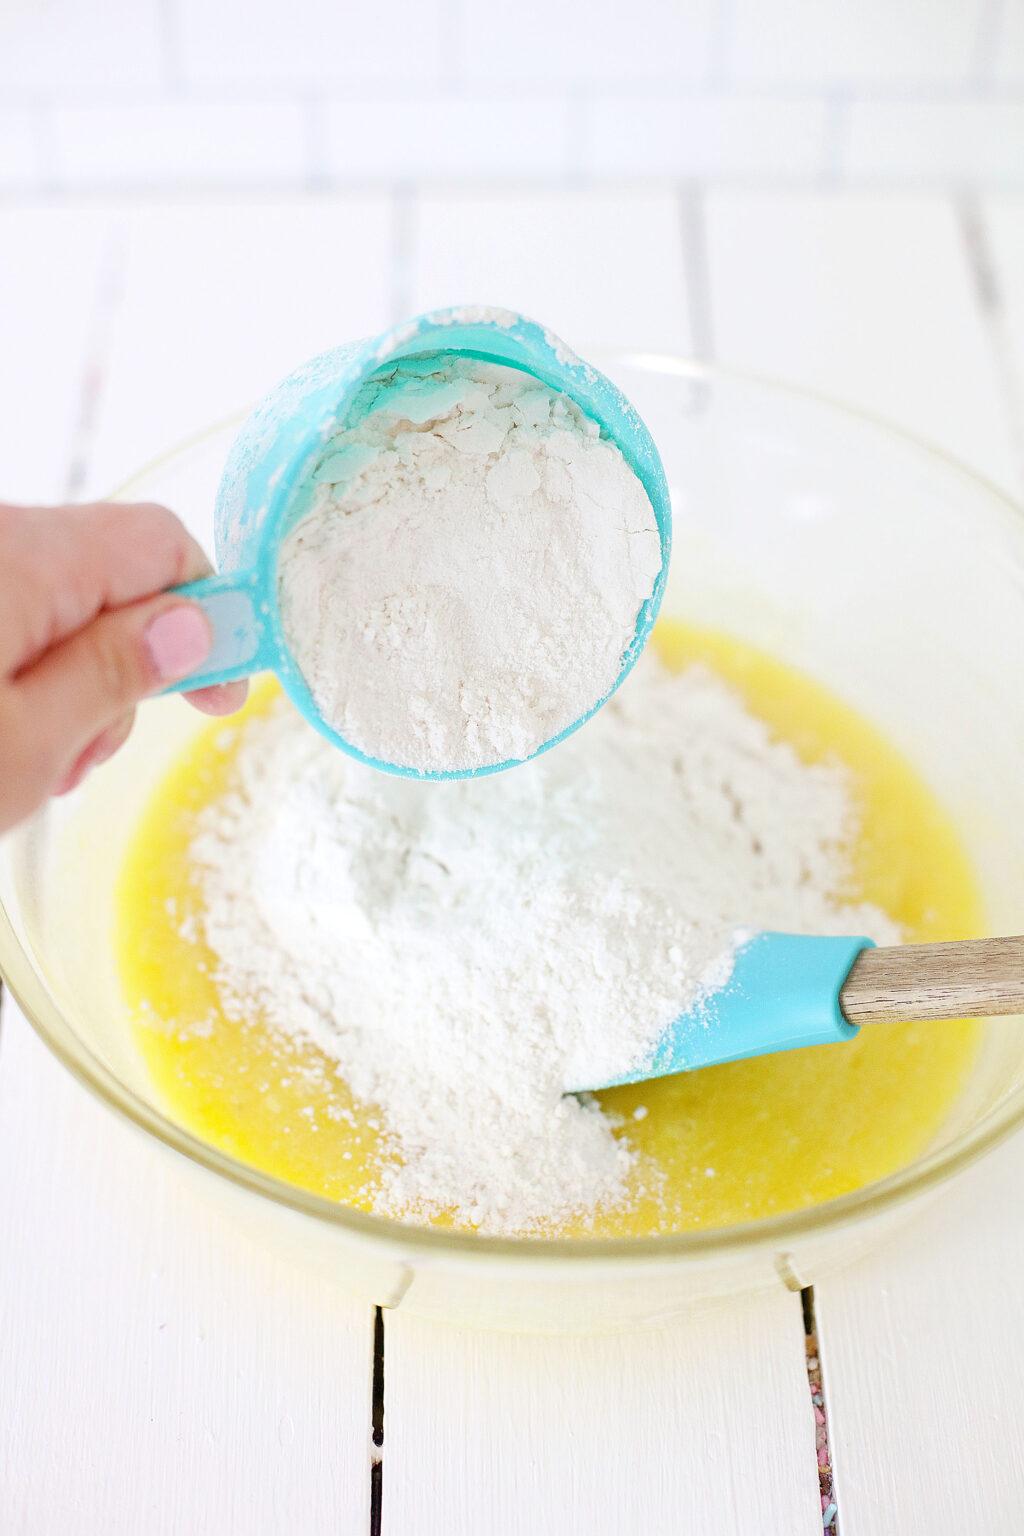 grinch donut ingredients in bowl